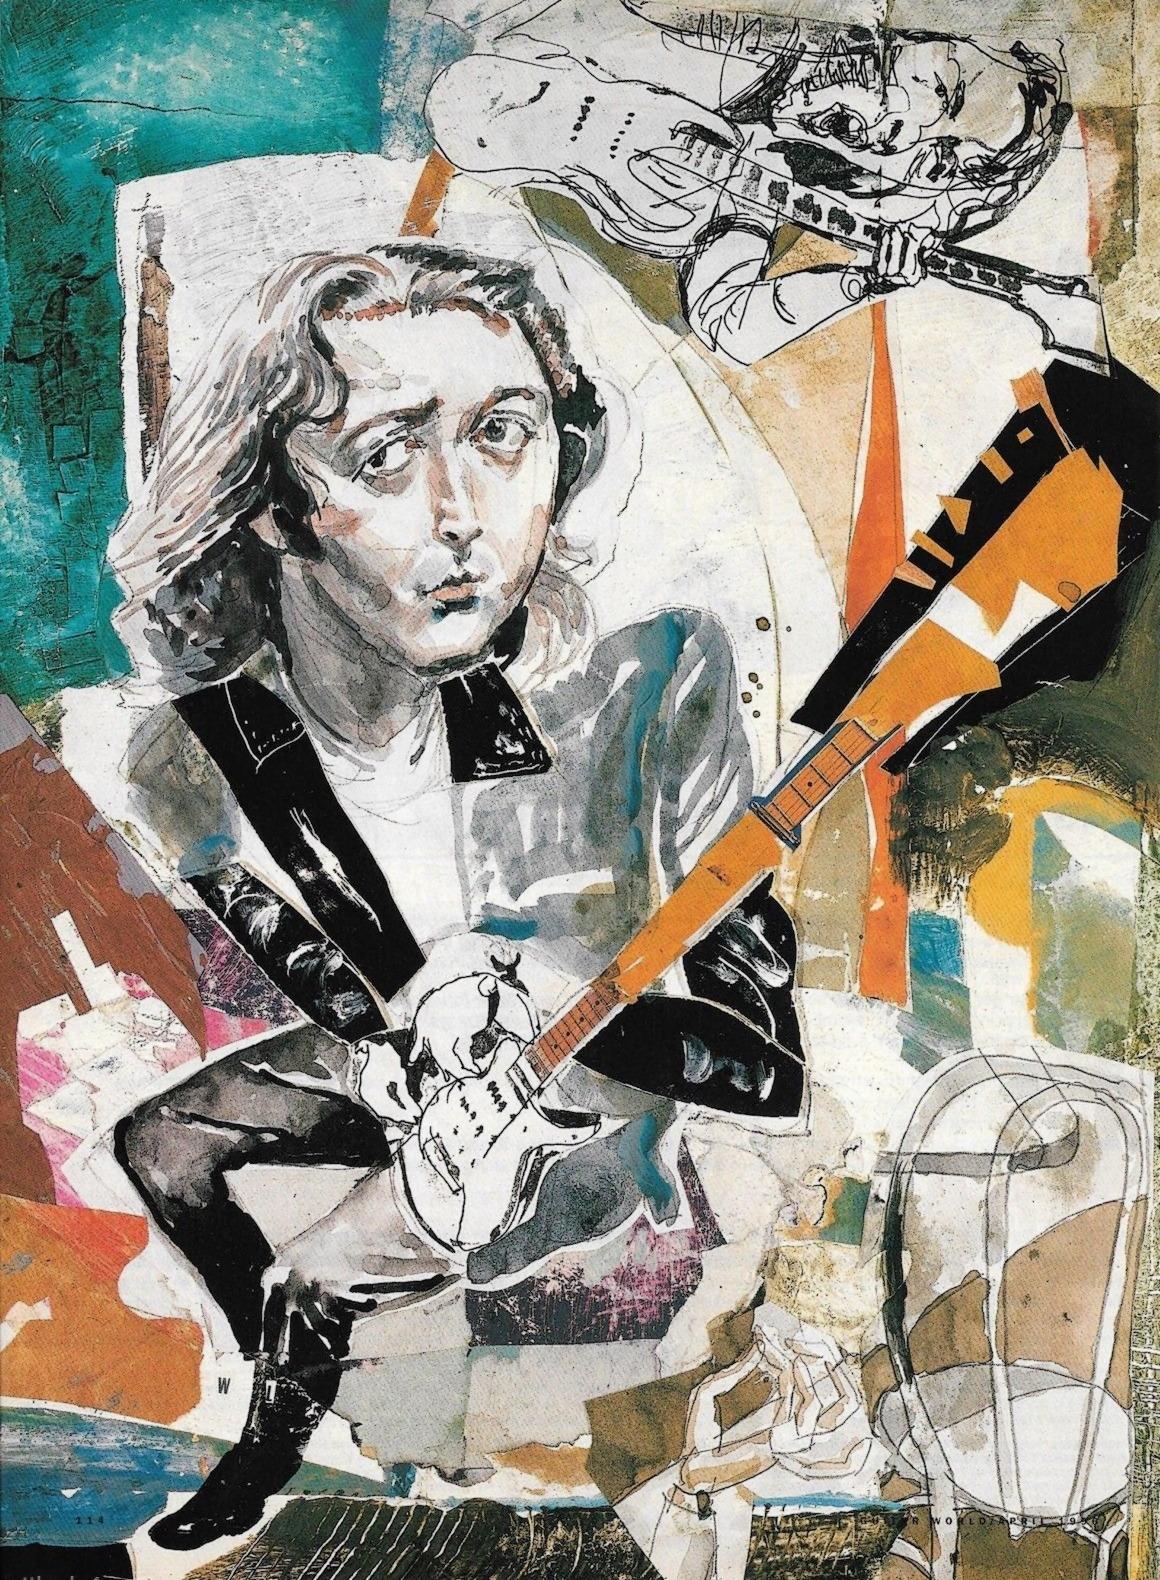 Dessins & peintures - Page 17 Tumblr_no5jmcvmB91riovnko1_1280